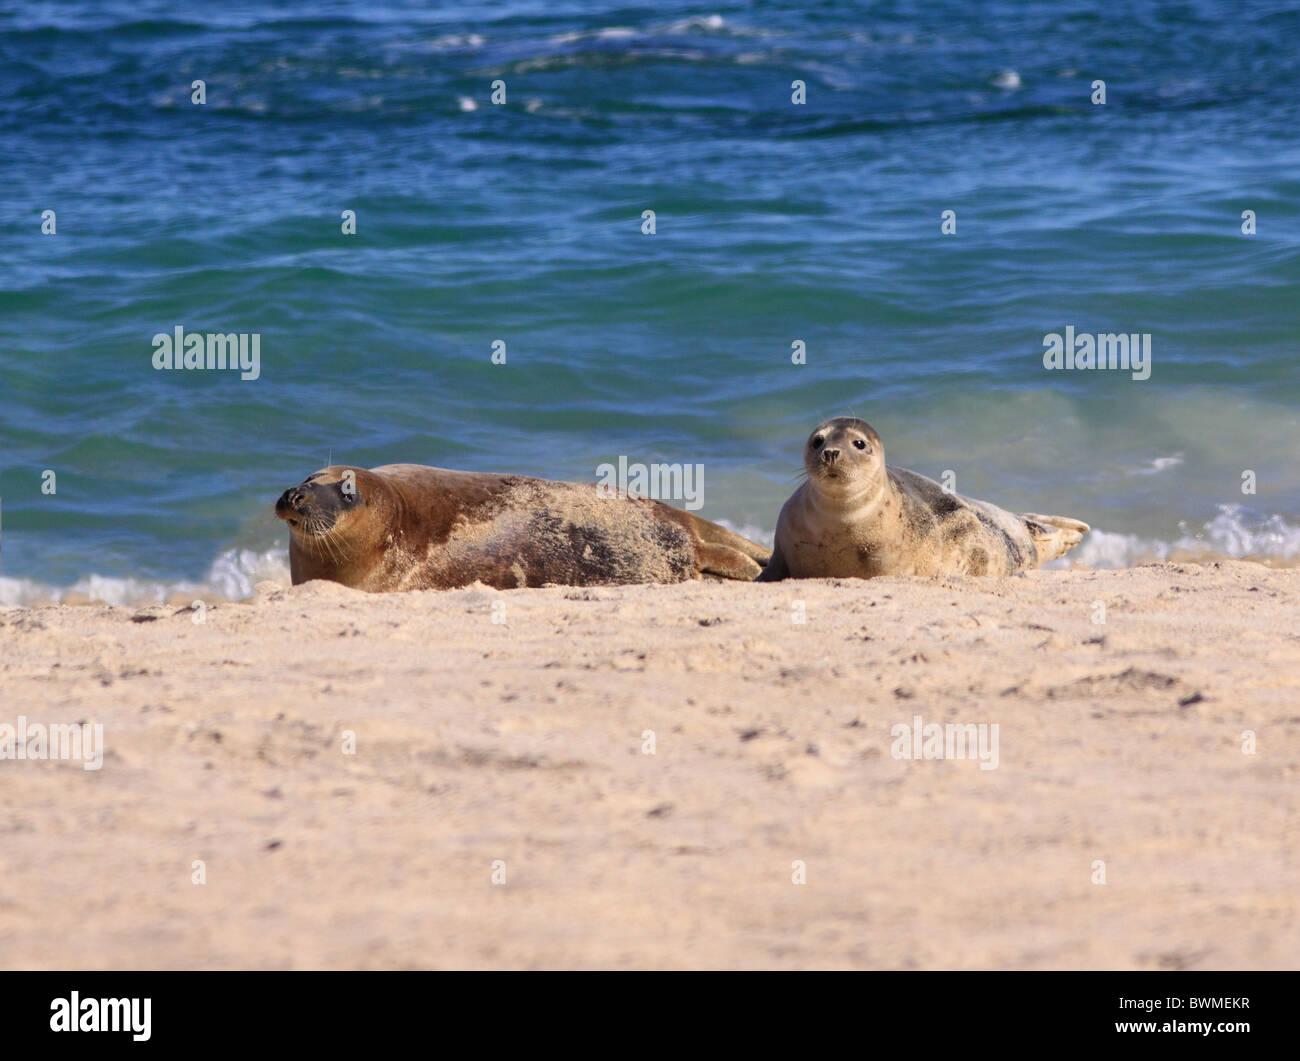 UK Scotland Hebridean Islands Common Seals on sandy beach - Stock Image